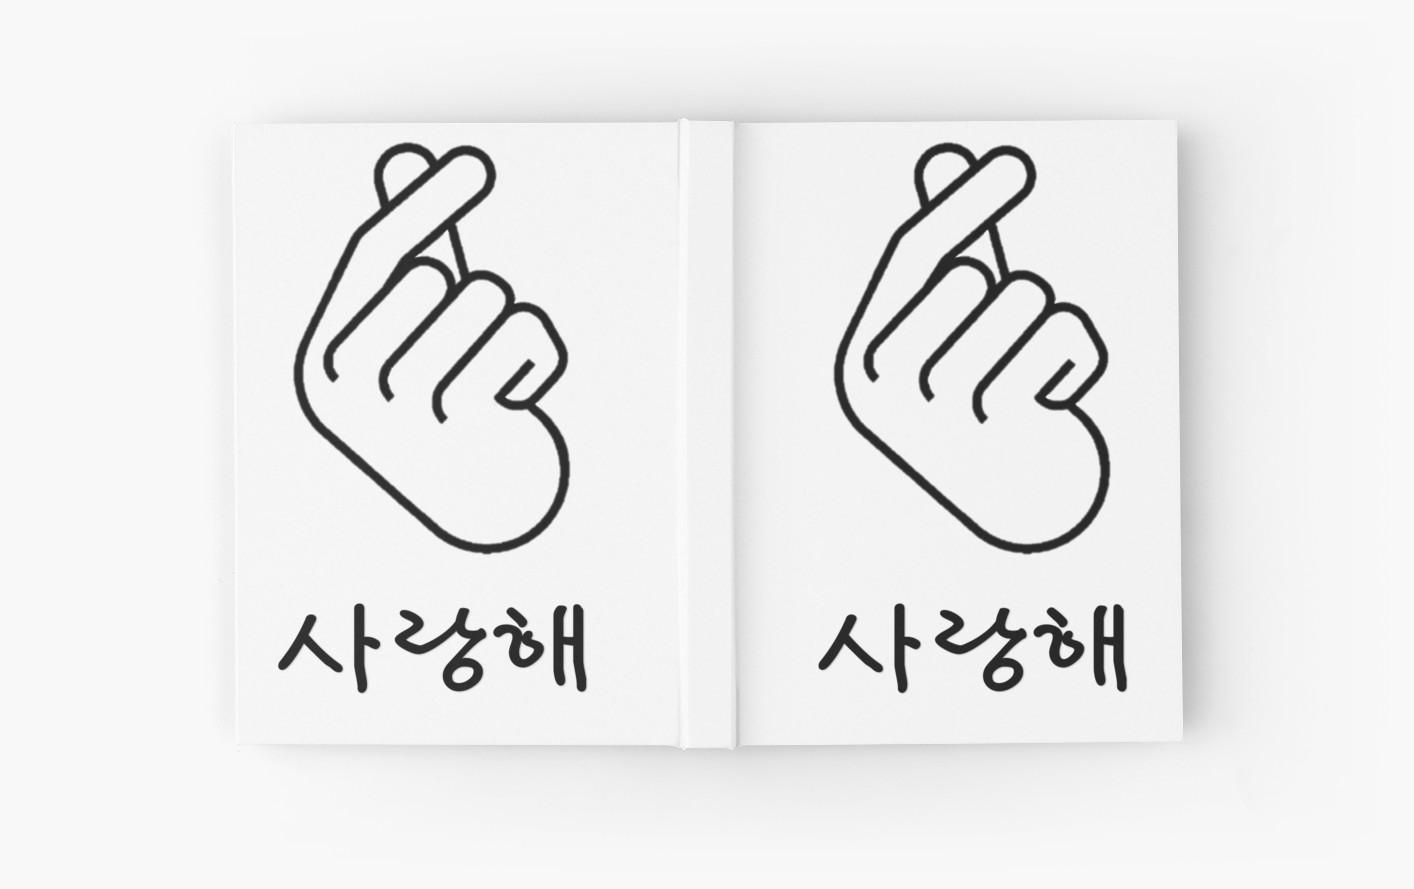 I Love You Sign Language Drawing At Getdrawingscom Free